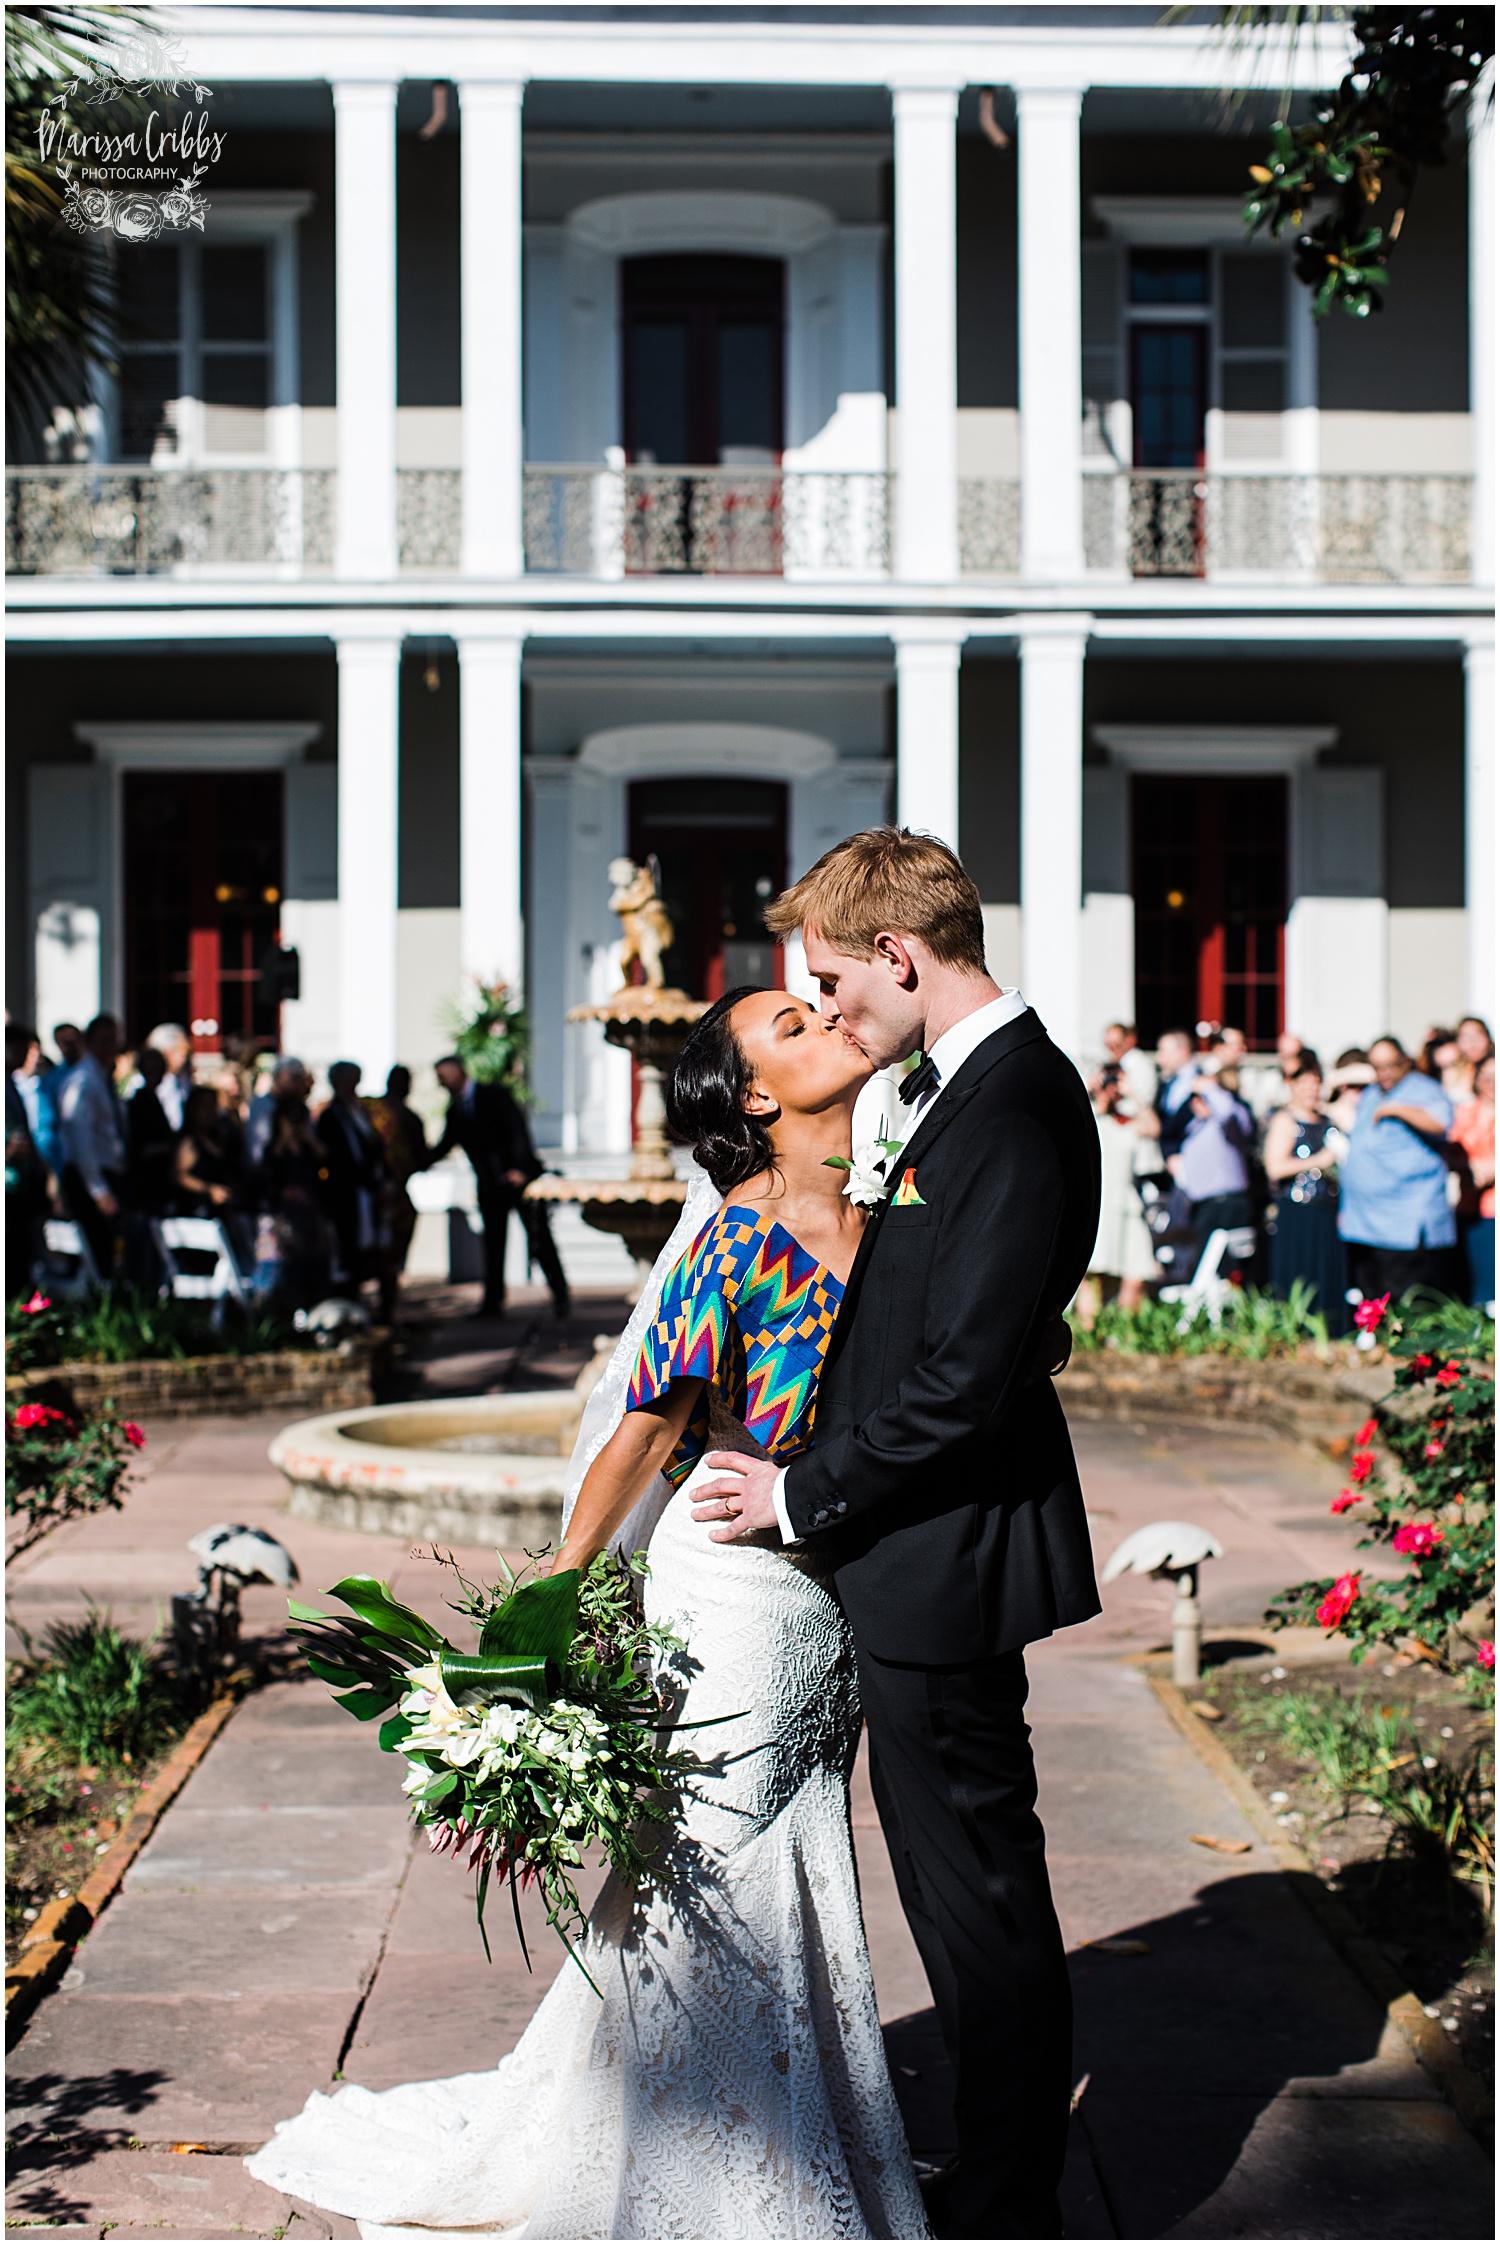 NOLA WEDDING   SARAH & MICHAEL   MARISSA CRIBBS PHOTOGRAPHY_4368.jpg